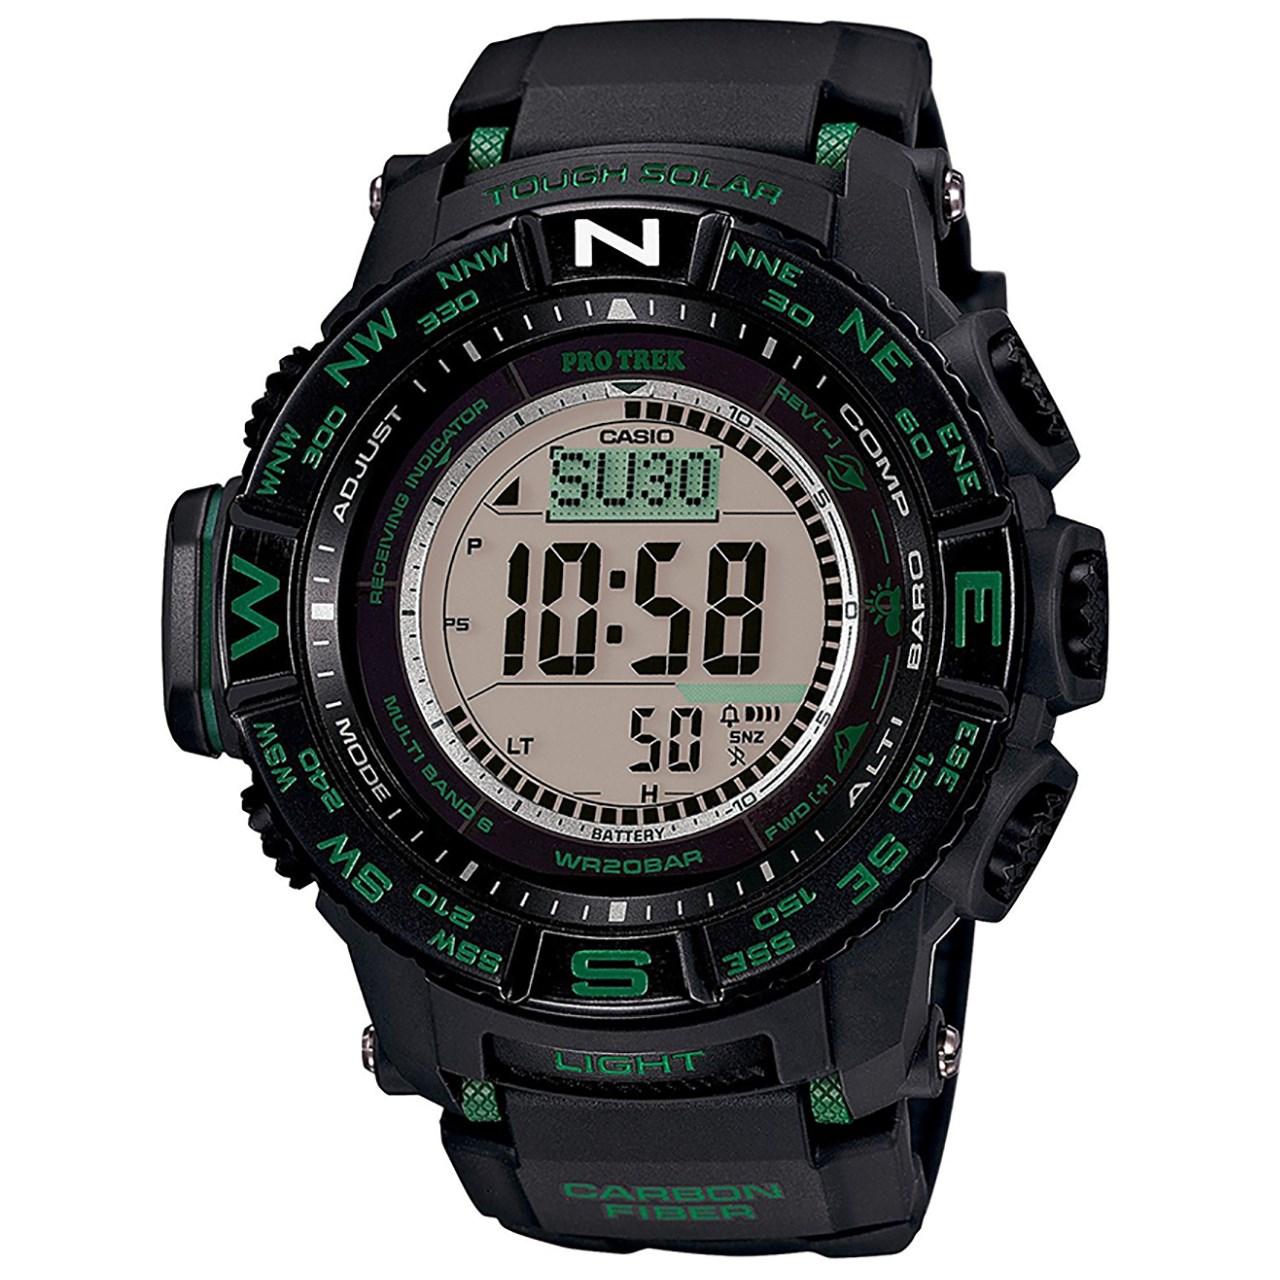 ساعت مچی دیجیتالی  مردانه  کاسیو پروترک مدل PRW-S3500-1DR